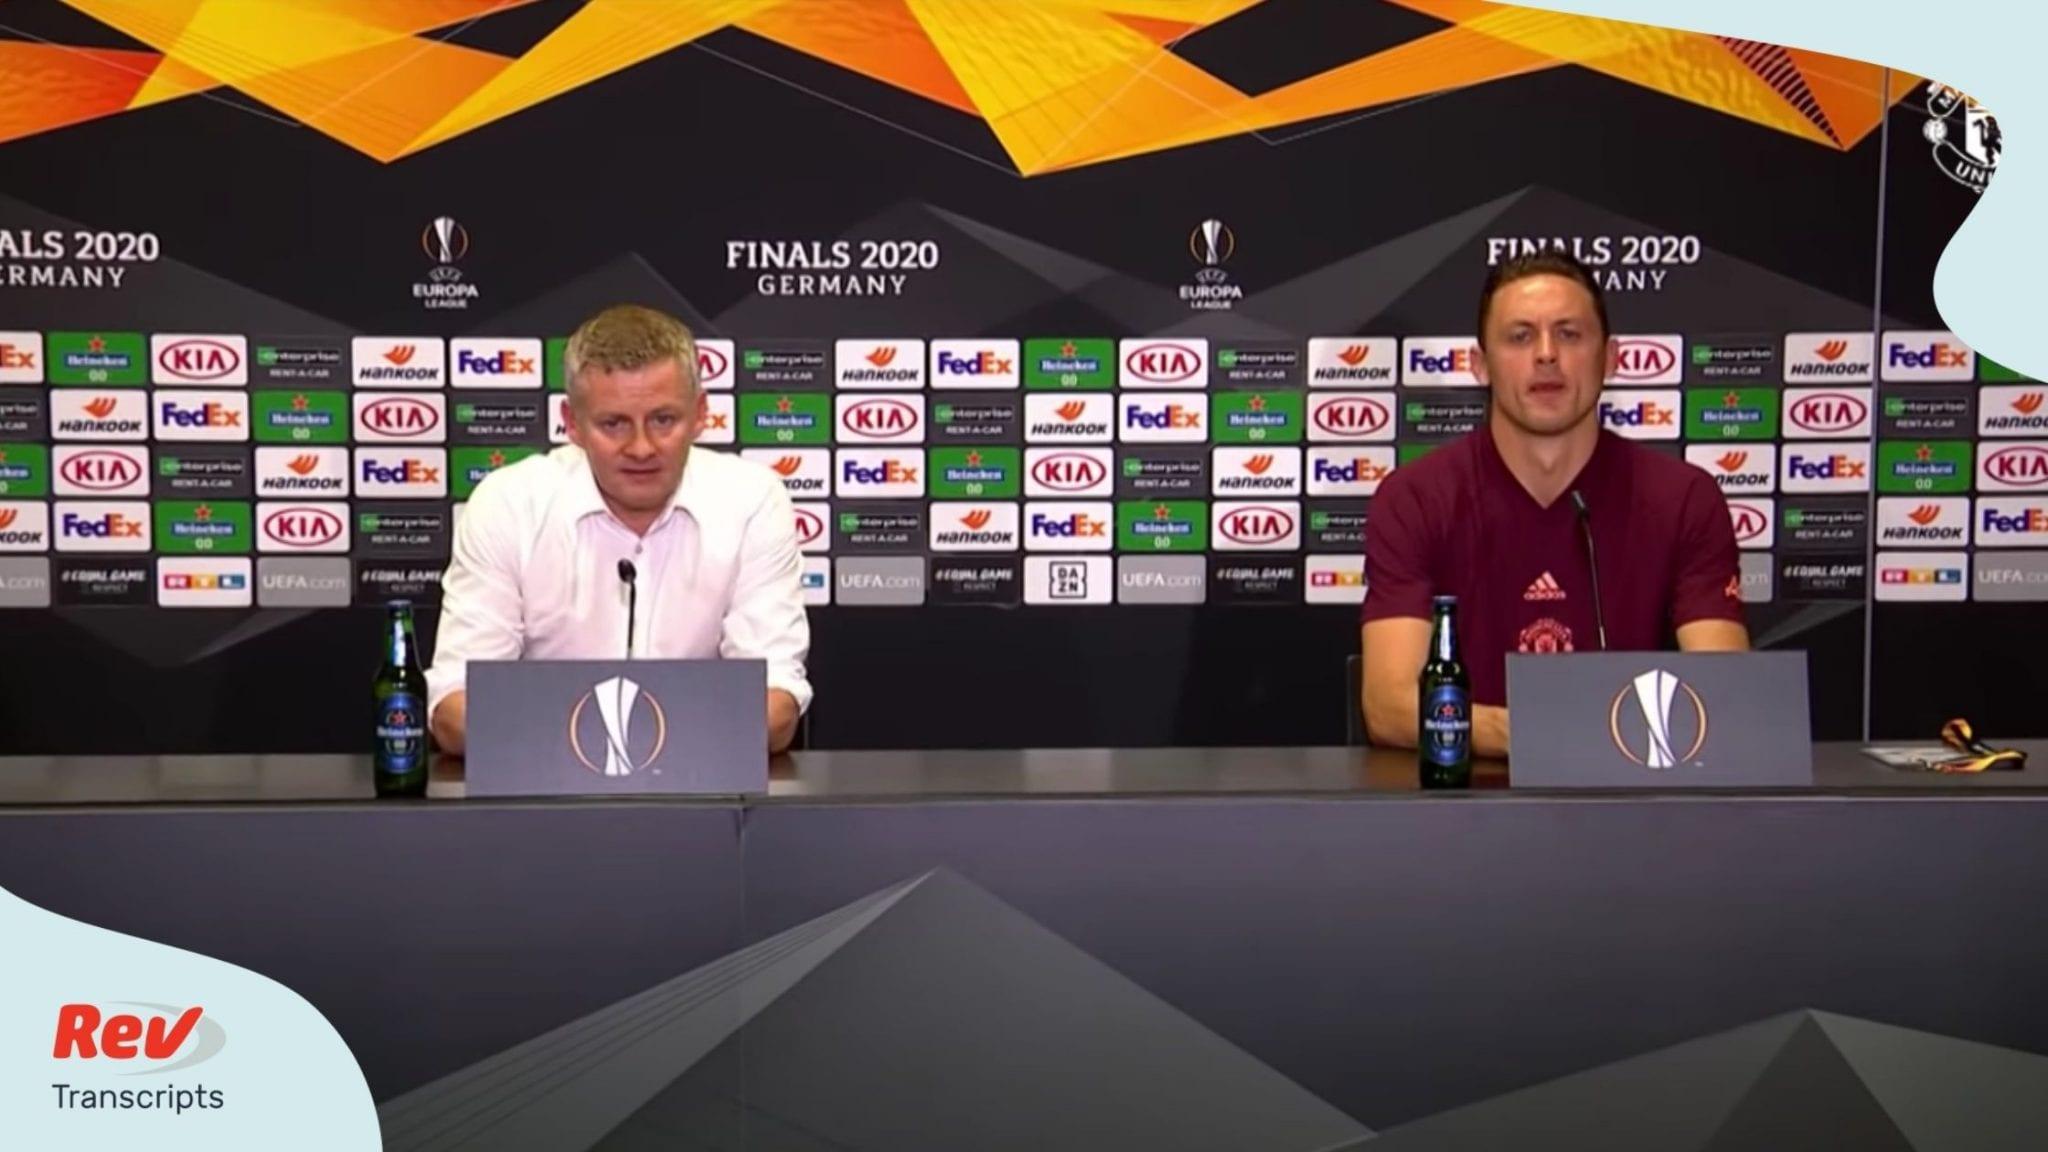 Ole Gunnar Solskjaer Post Match Press Conference Transcript: Manchester United v. FC Copenhagen